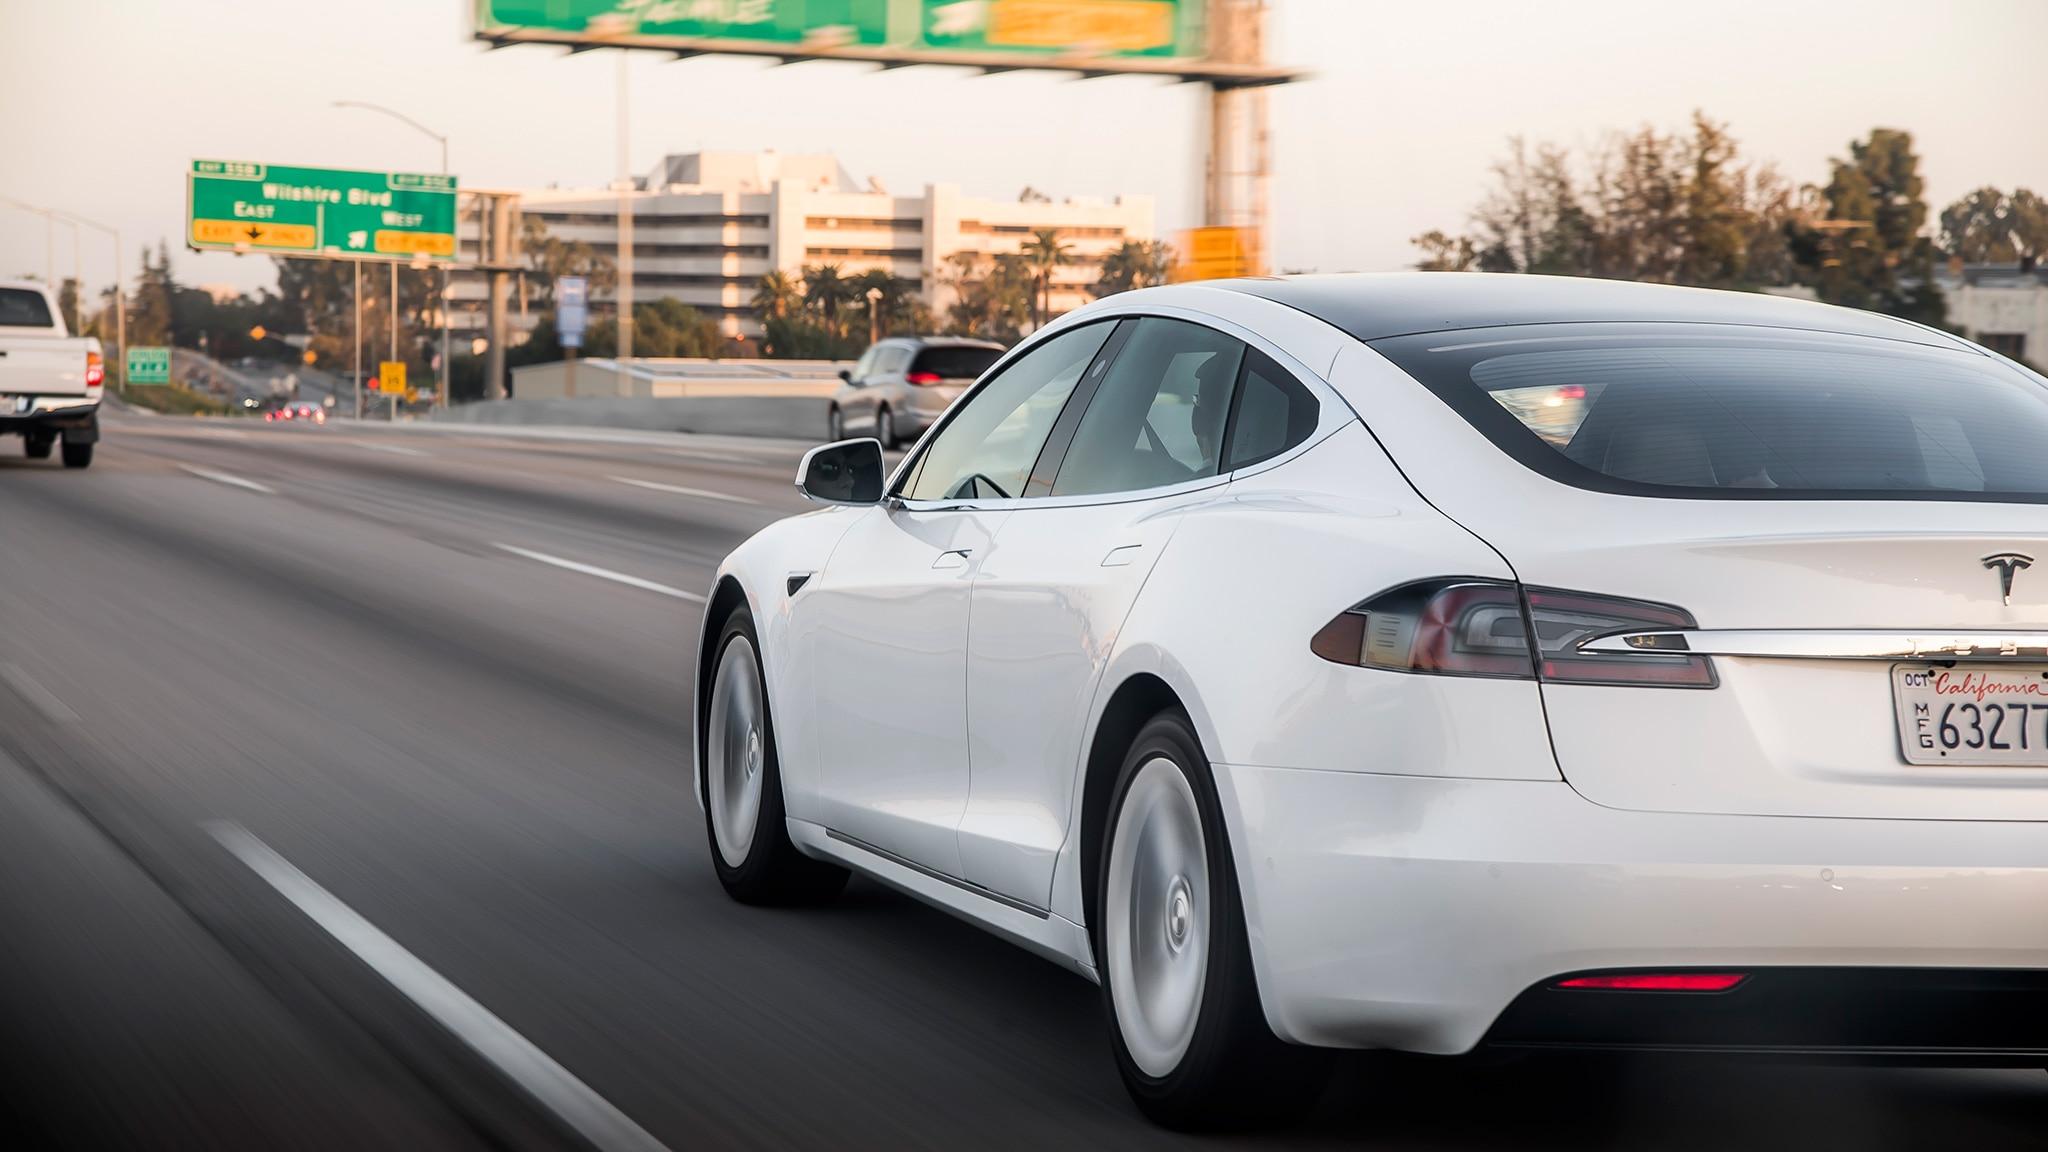 Tesla Model S Gets Major Updates to Range, Charging, and More